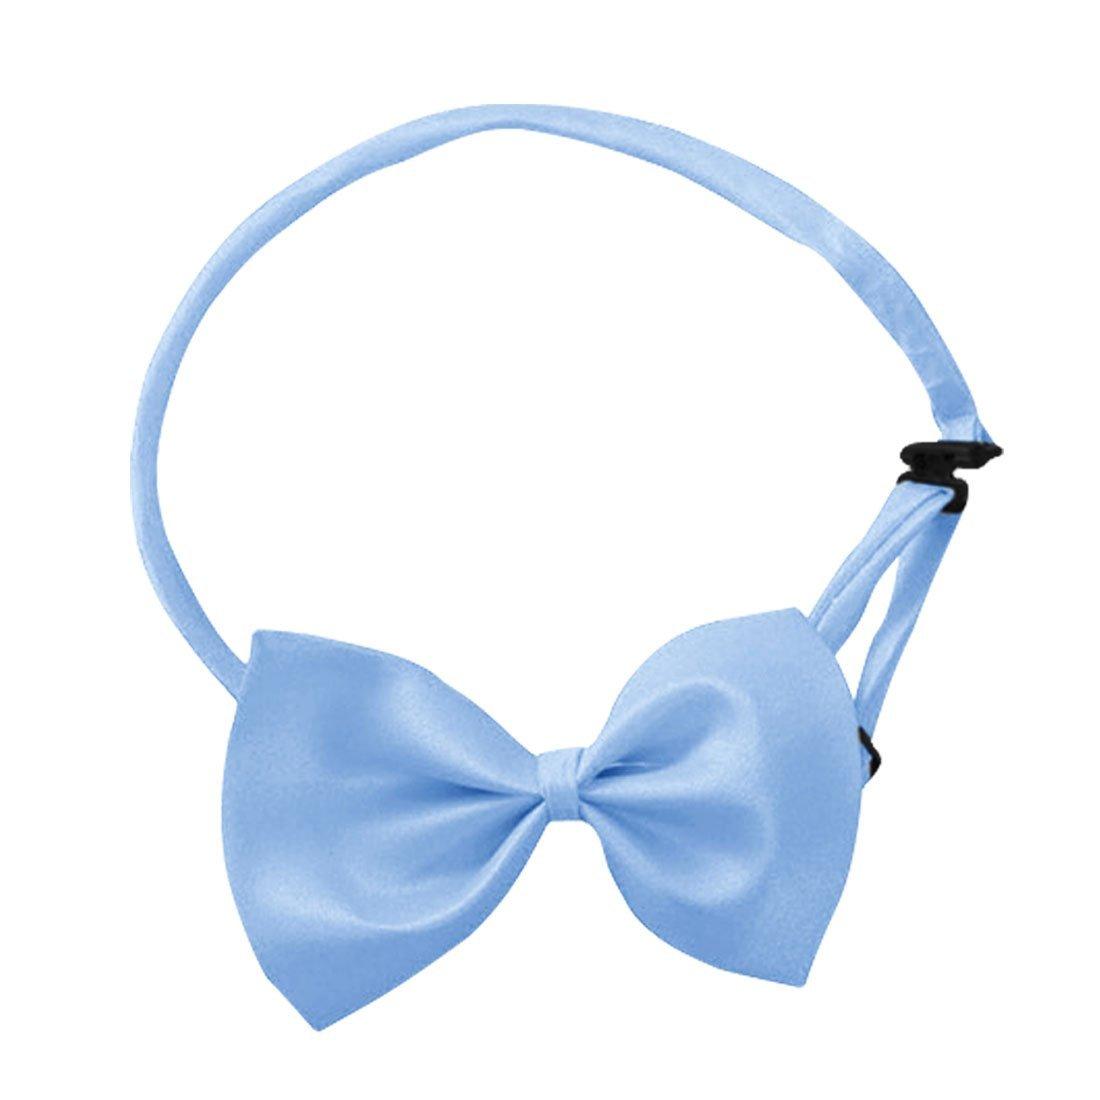 MYTL Blue Men Polyester Adjustable Strap Clip-on Installation Bow Tie